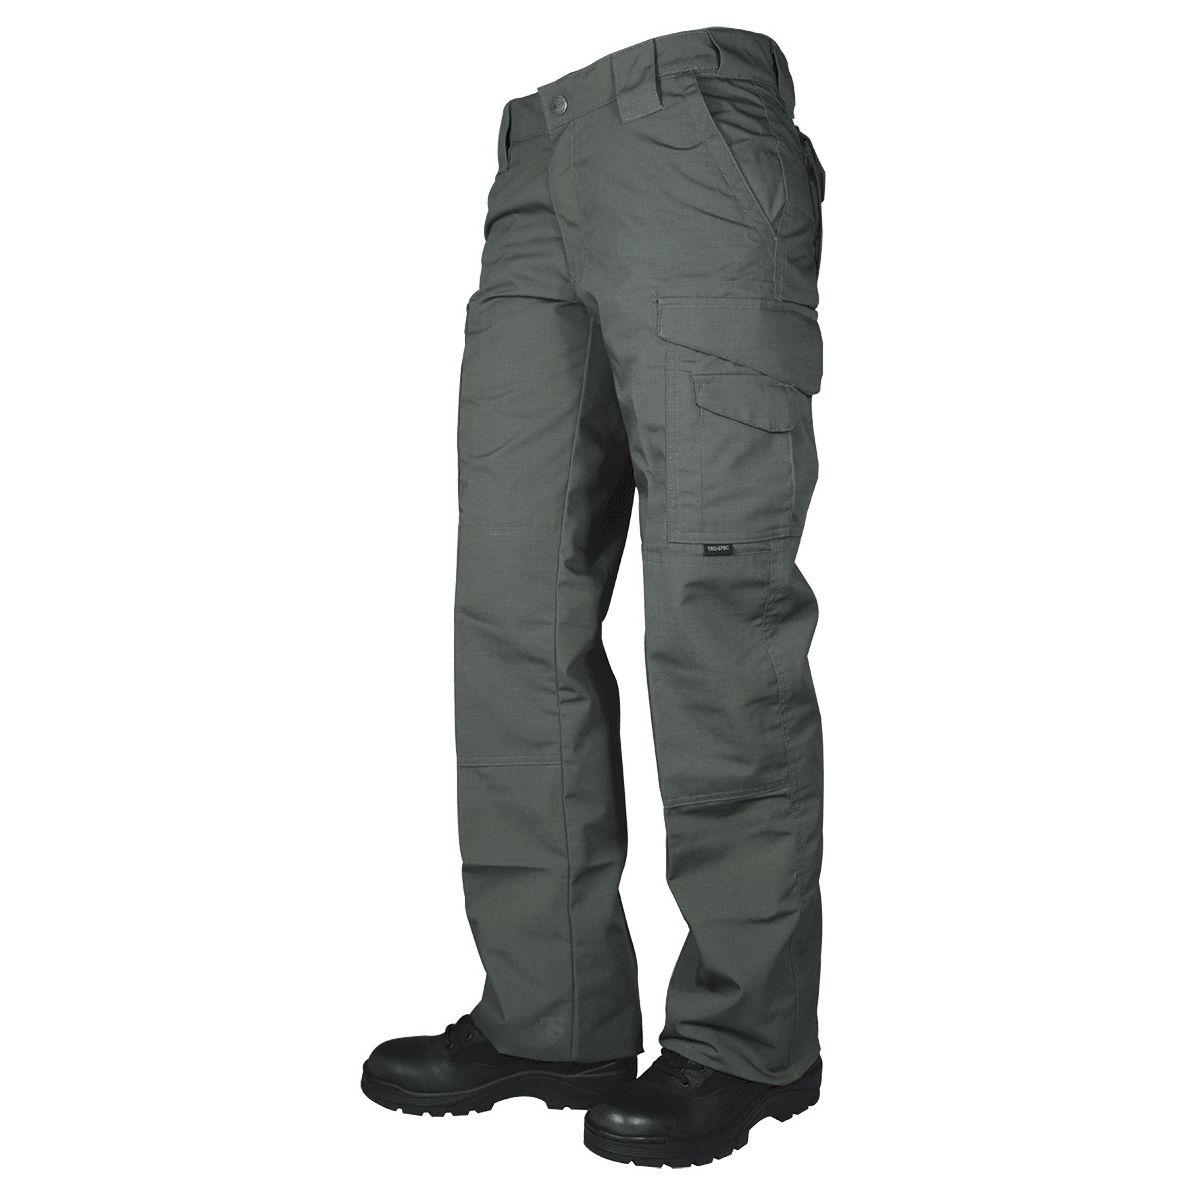 Kalhoty dámské 24-7 TACTICAL rip-stop ZELENÉ - zvìtšit obrázek